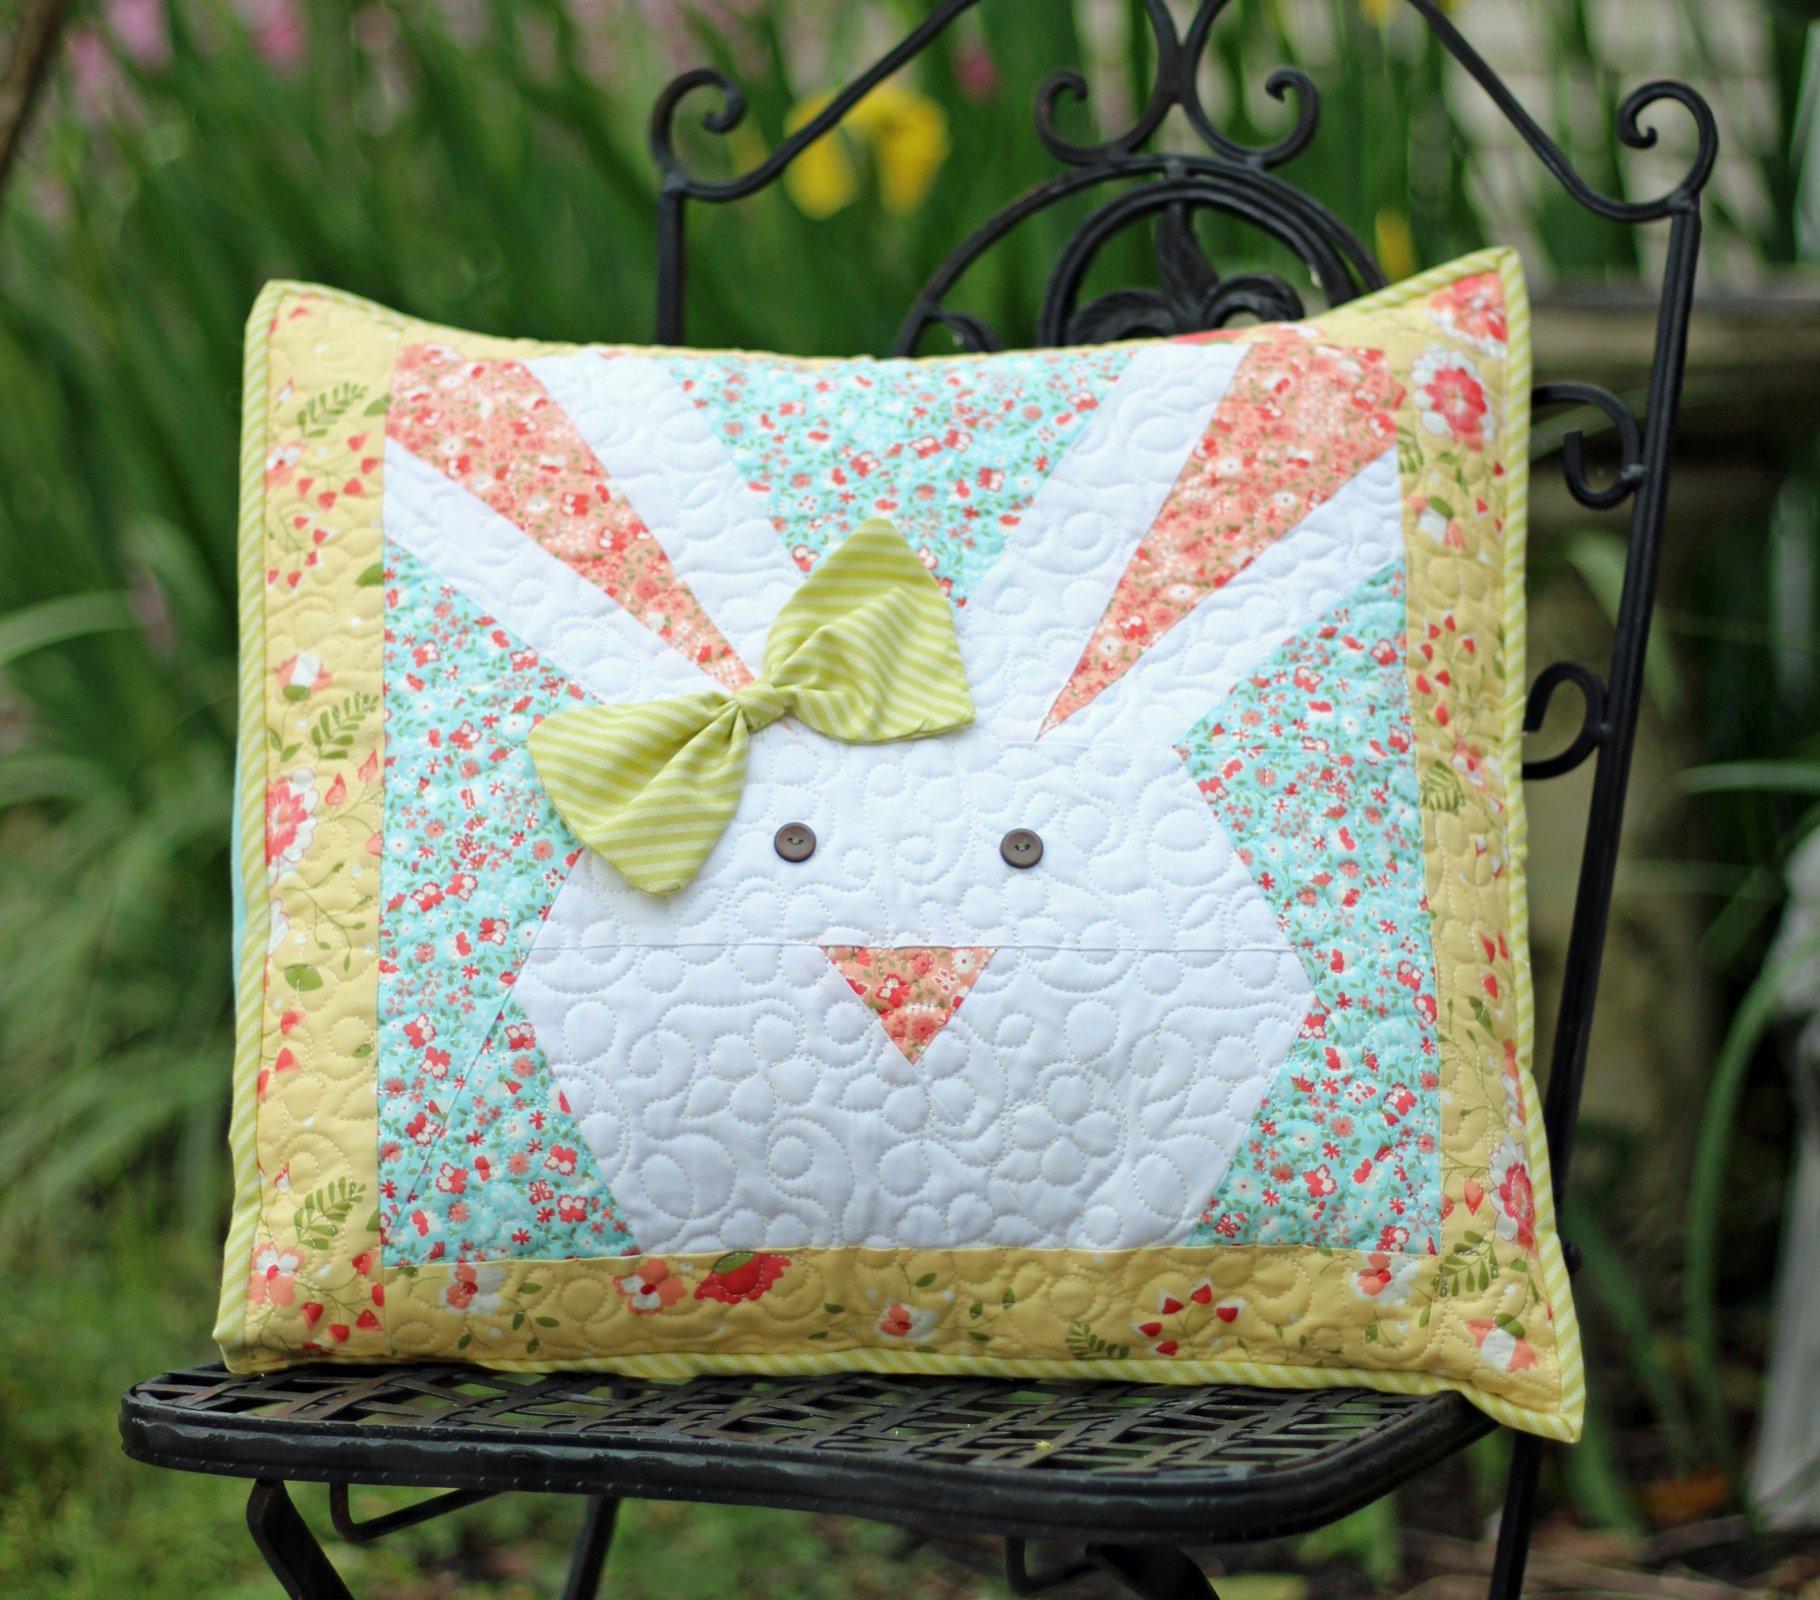 Sew Chic Rabbit Pillow Kit